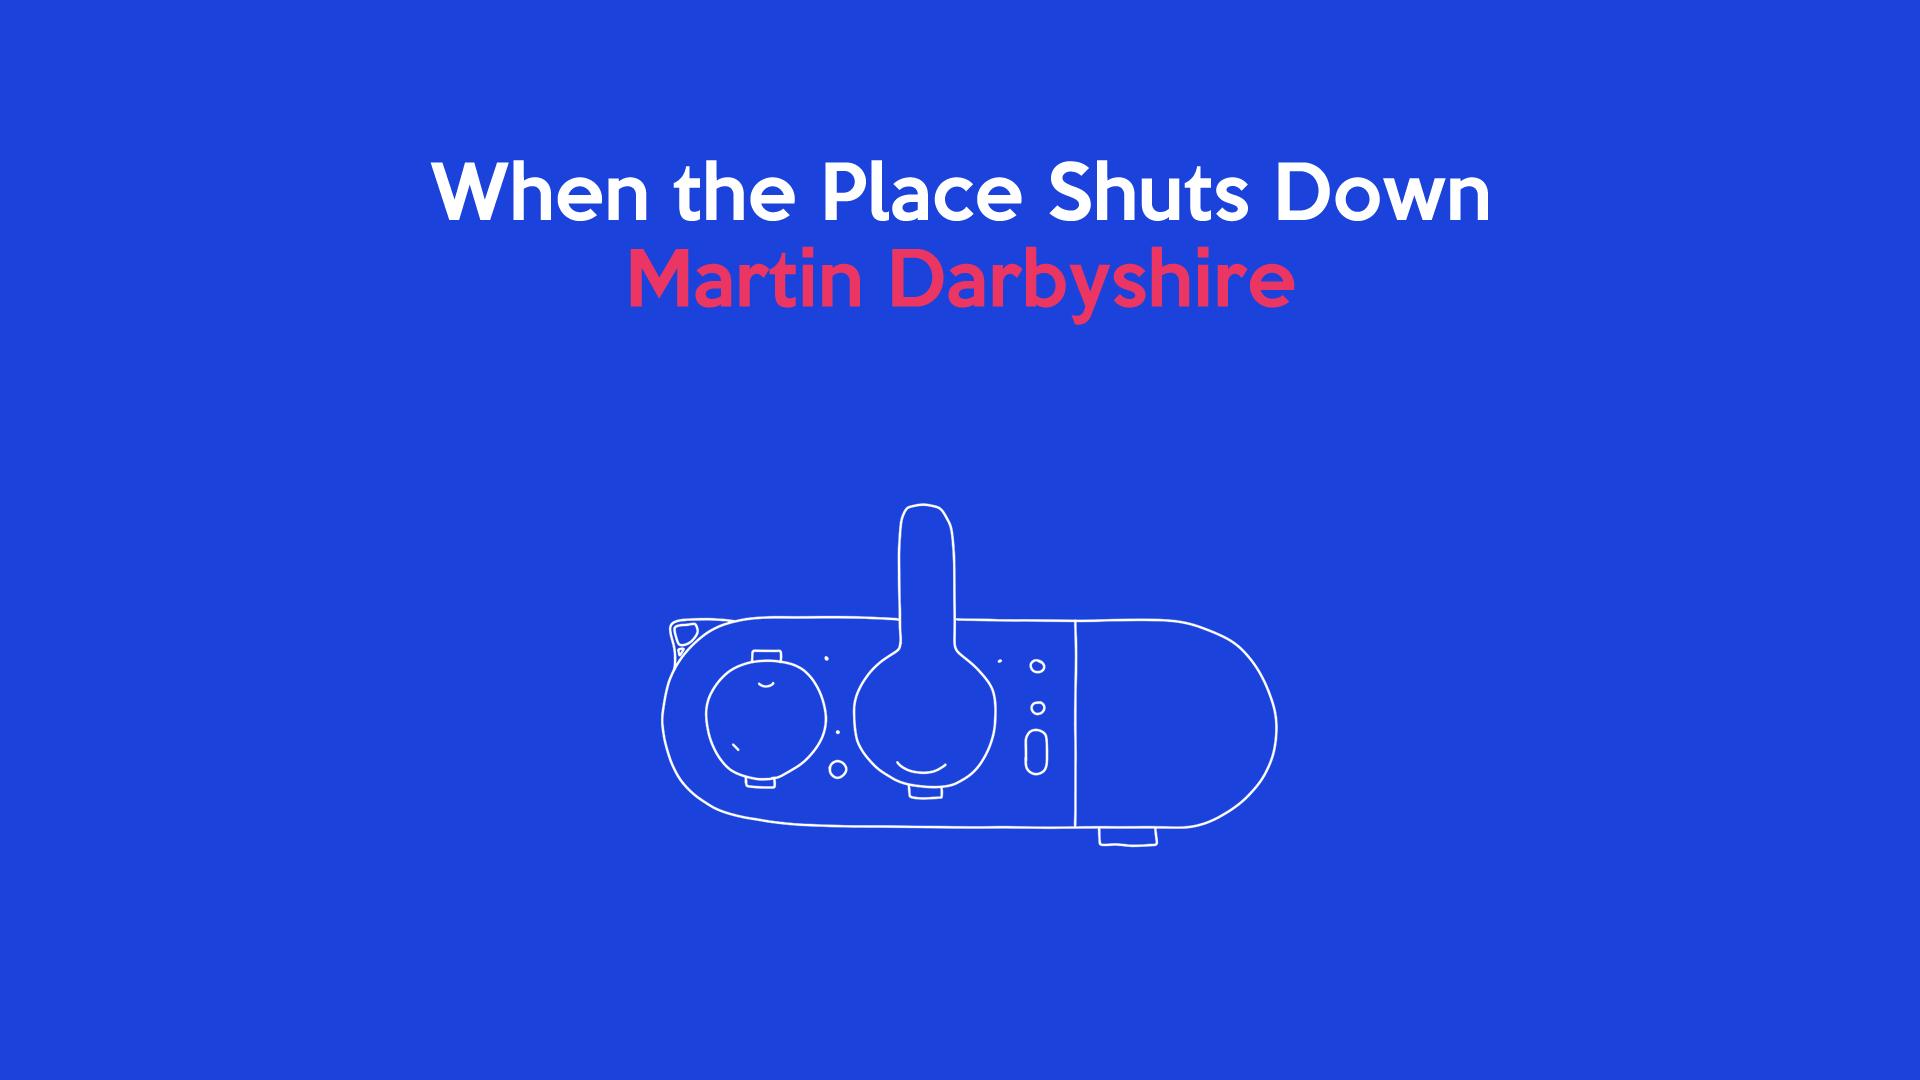 When the Place Shuts Down: Martin Darbyshire